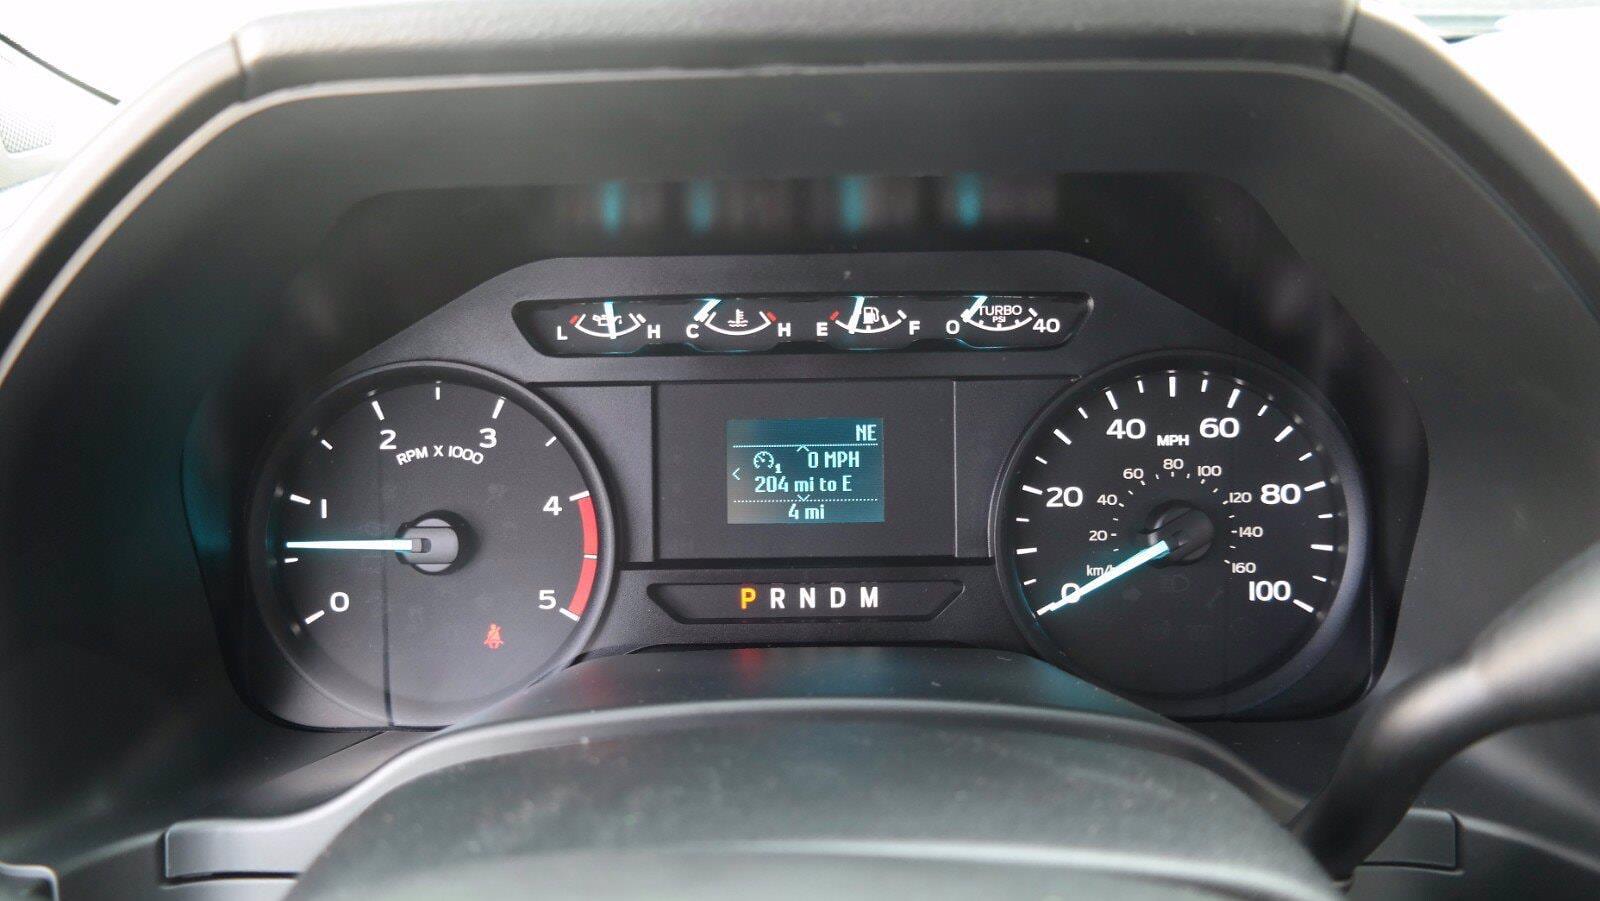 2021 Ford F-600 Regular Cab DRW 4x4, Cab Chassis #FLU10124 - photo 11